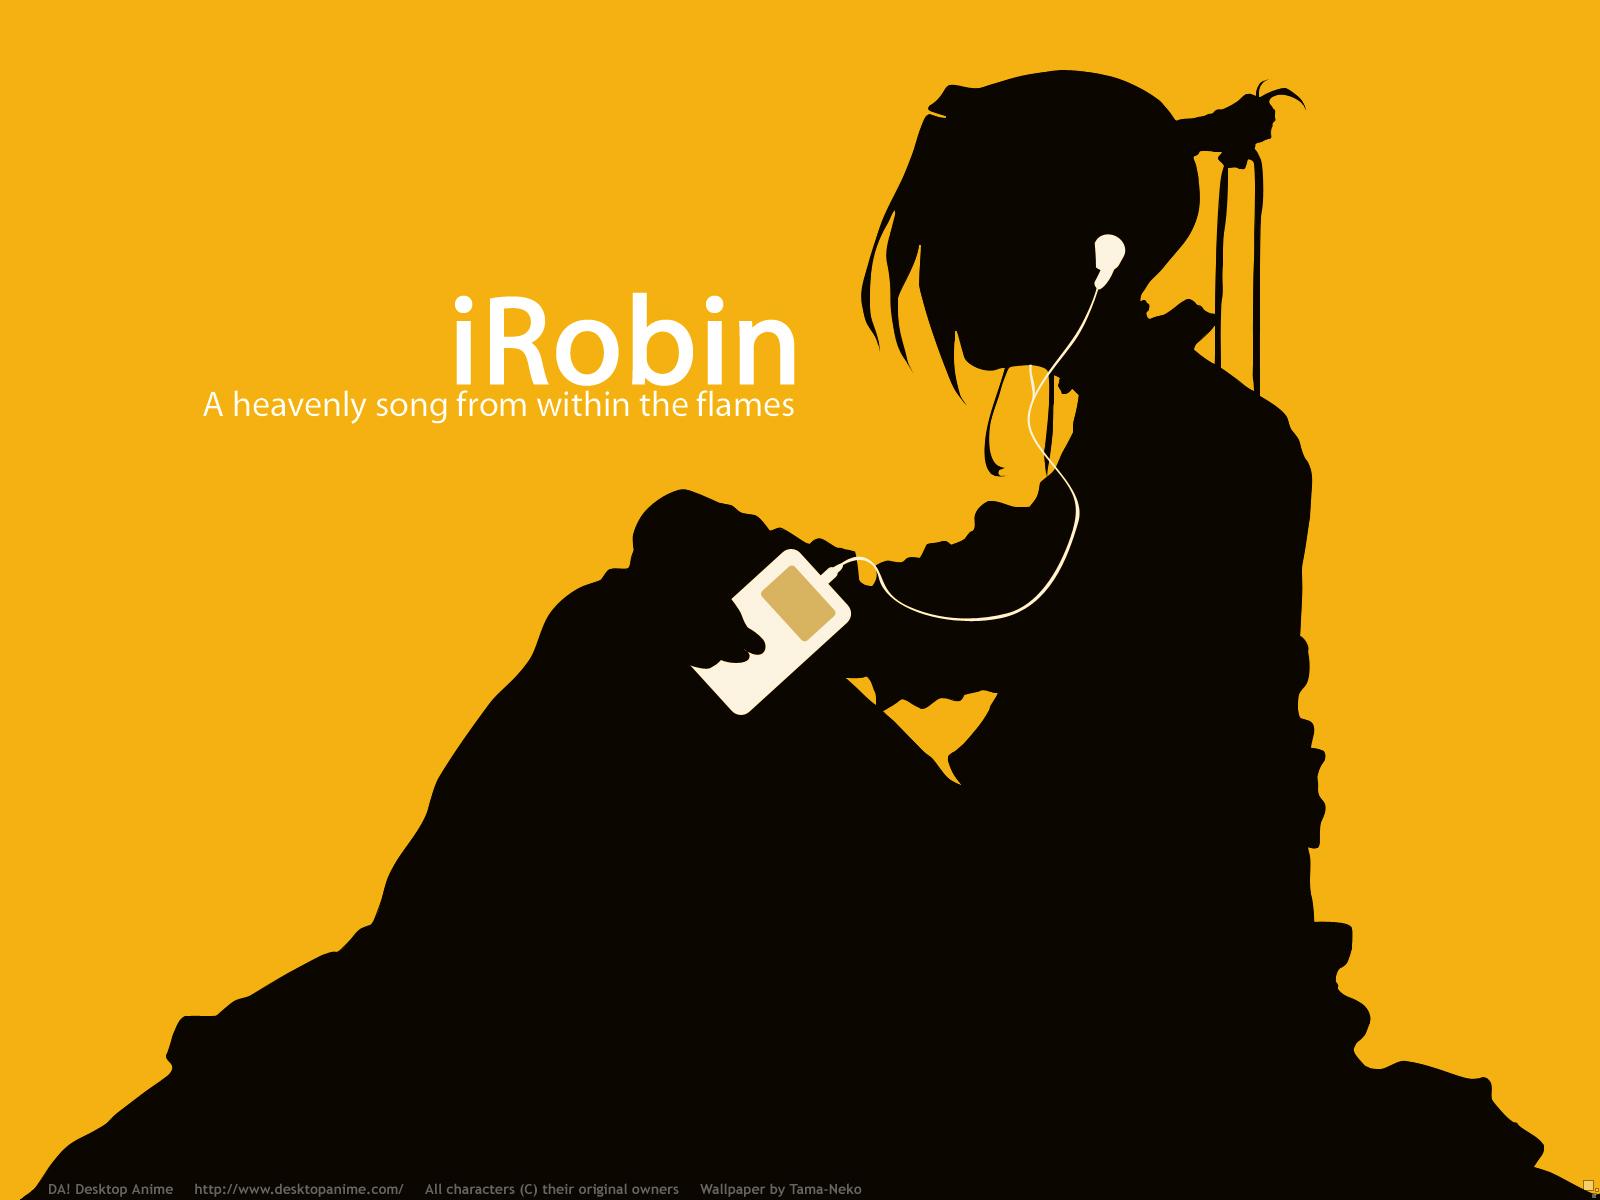 ipod parody robin_sena silhouette witch_hunter_robin yellow